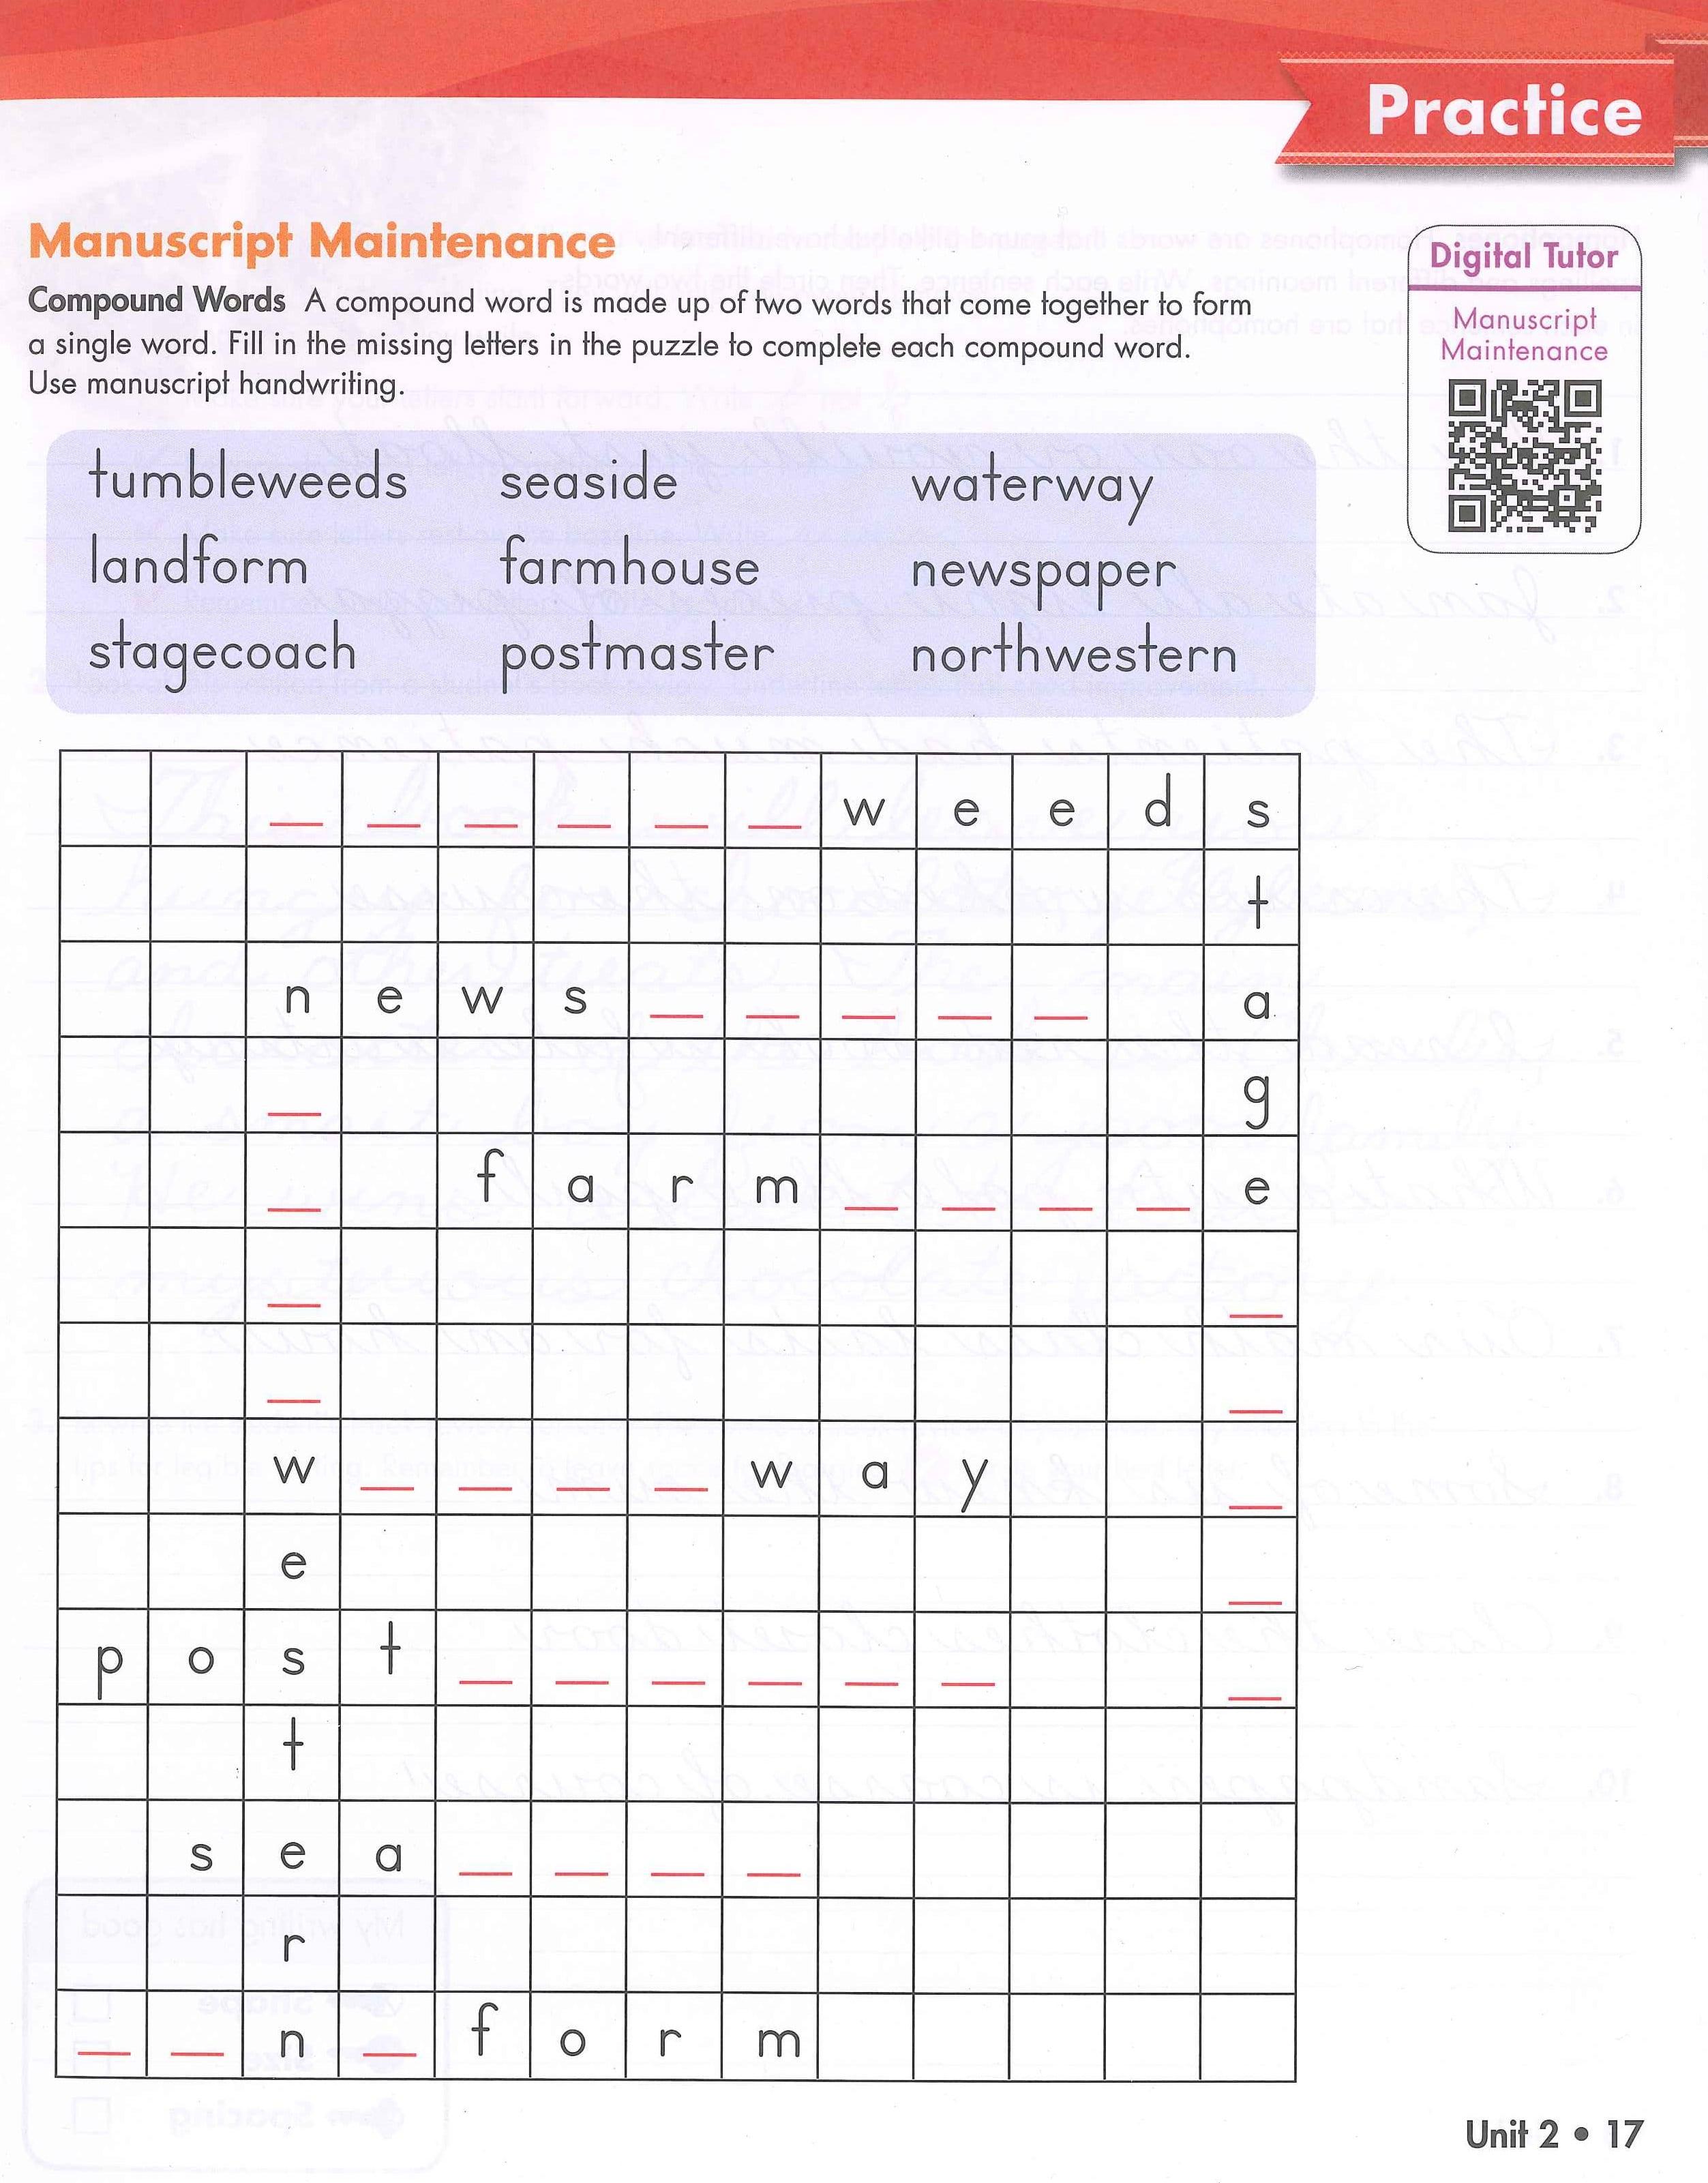 Sale On Zaner Bloser Handwriting M Cript Maintenance